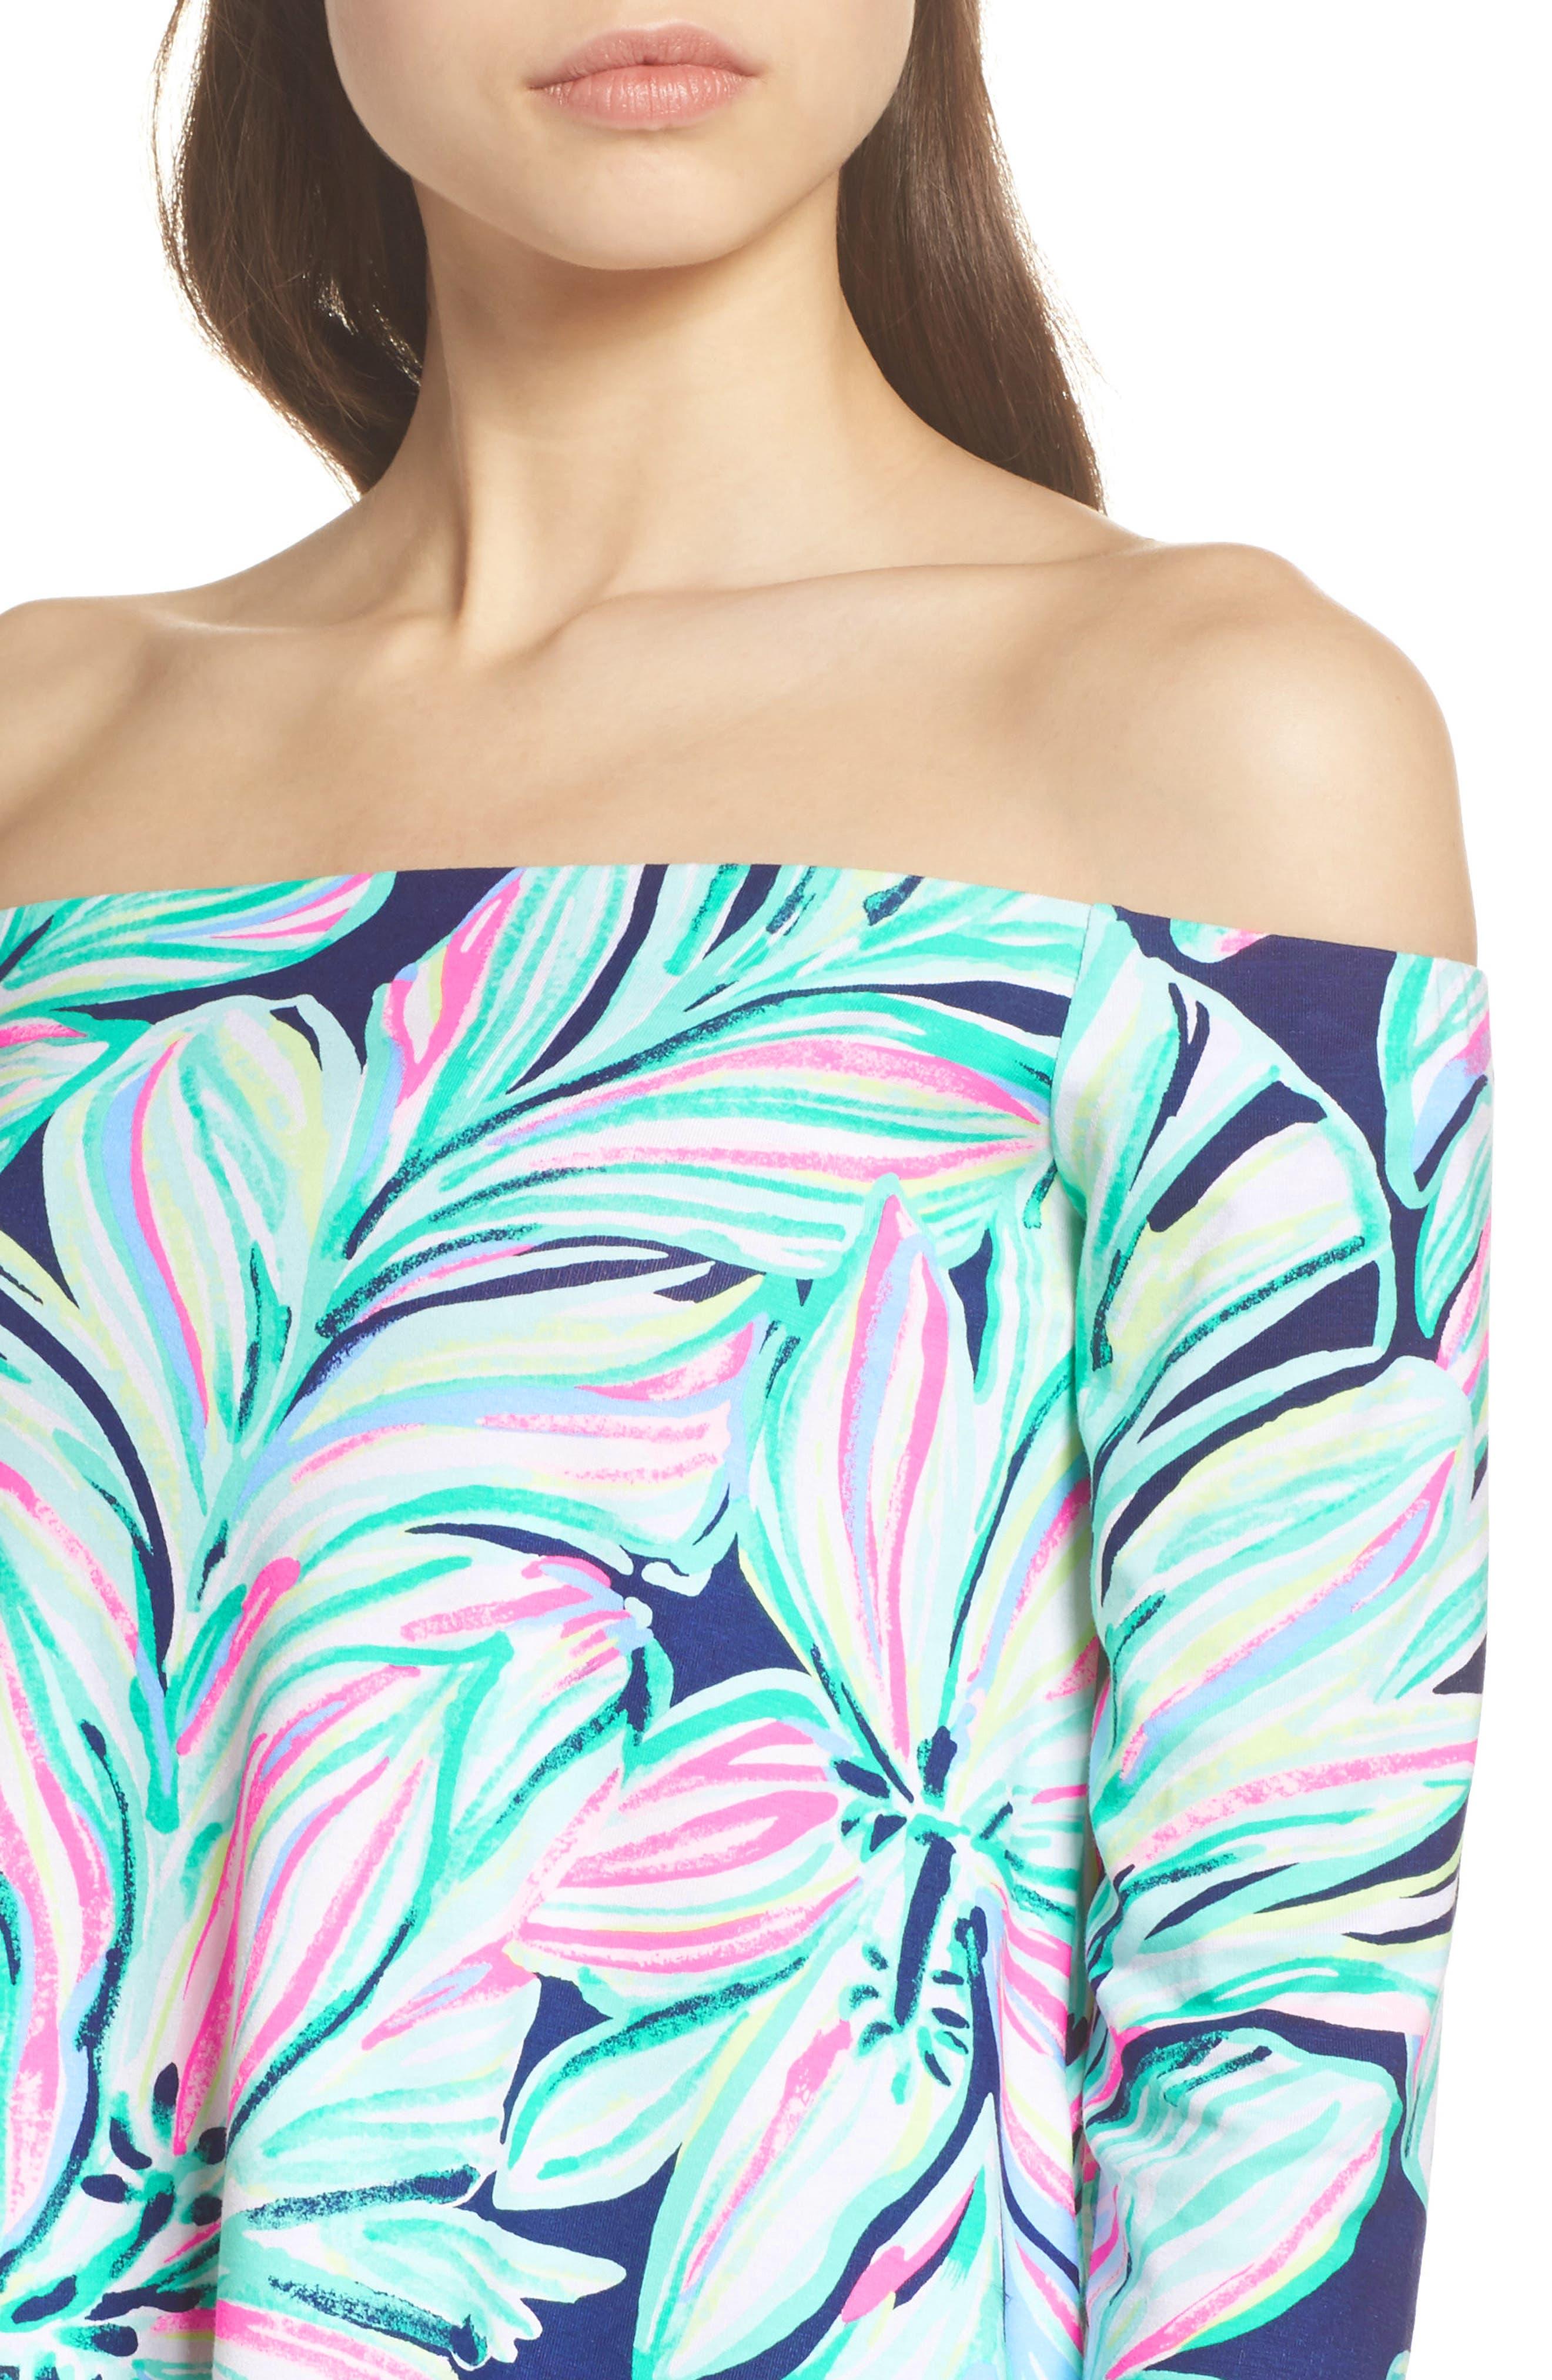 Weslee Floral Top & Pants,                             Alternate thumbnail 5, color,